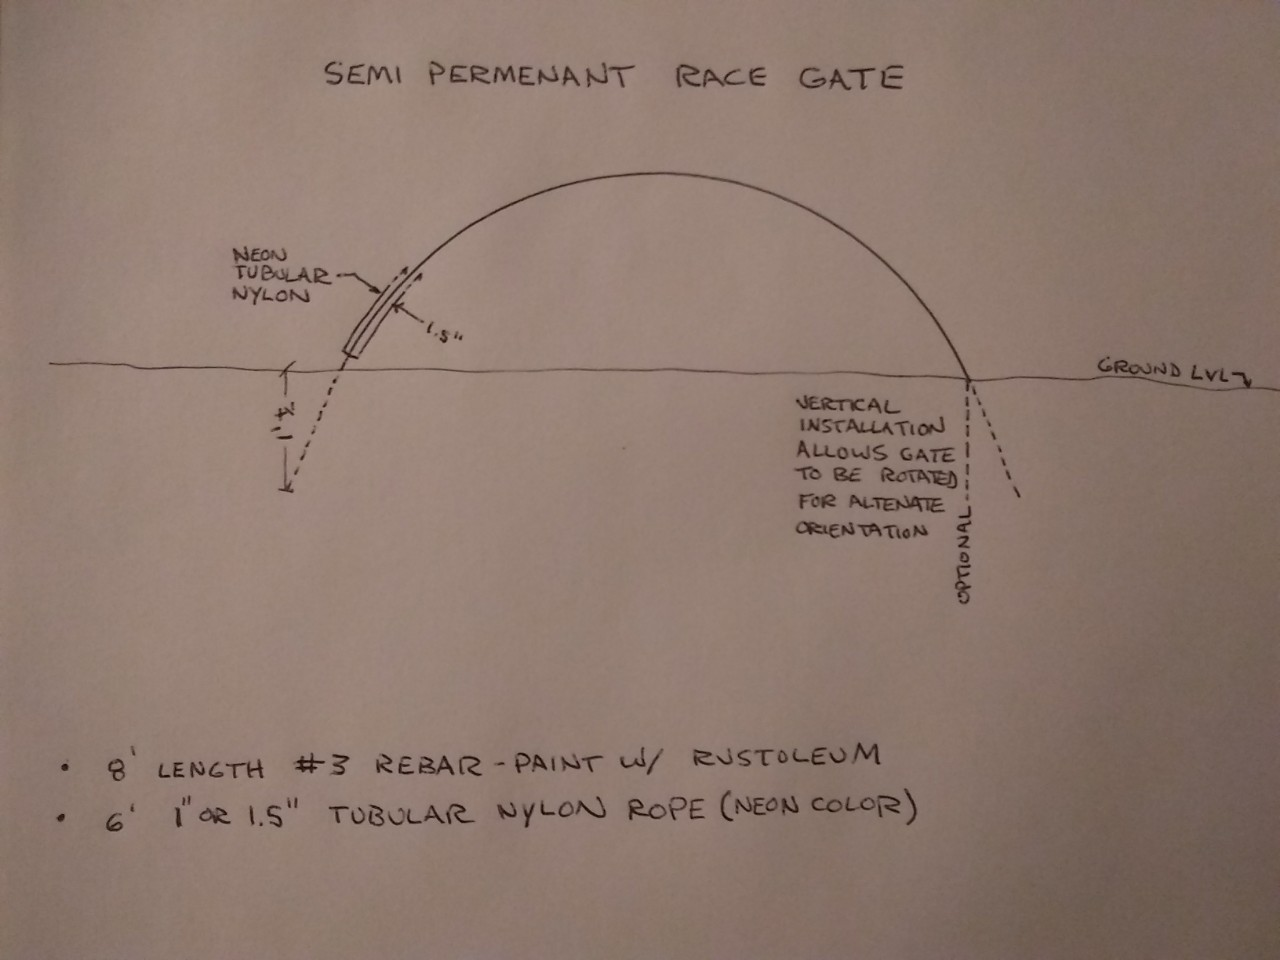 Semi Permanent Race Gate